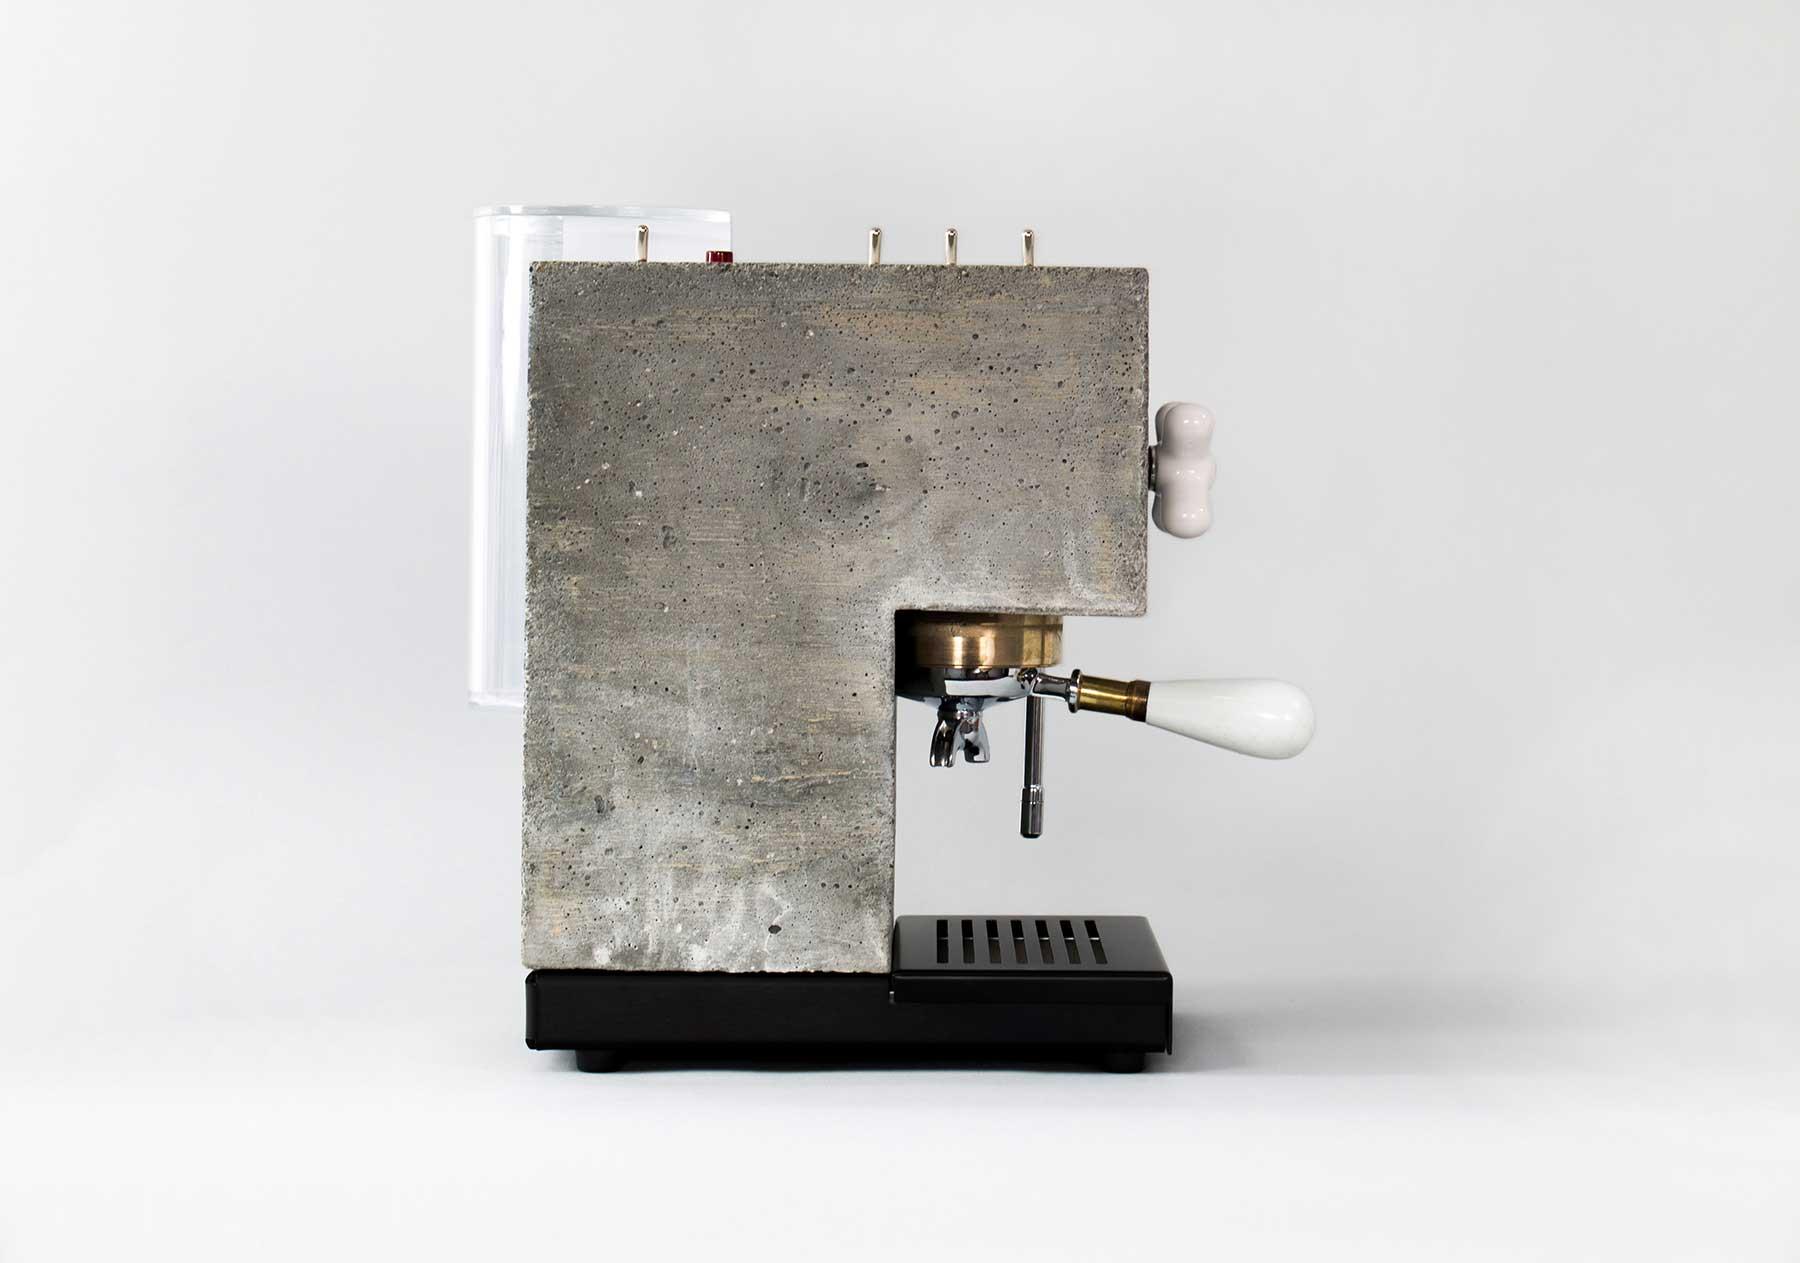 Kaffeemaschine aus Beton The-Anza-beton-kaffeemaschine_05